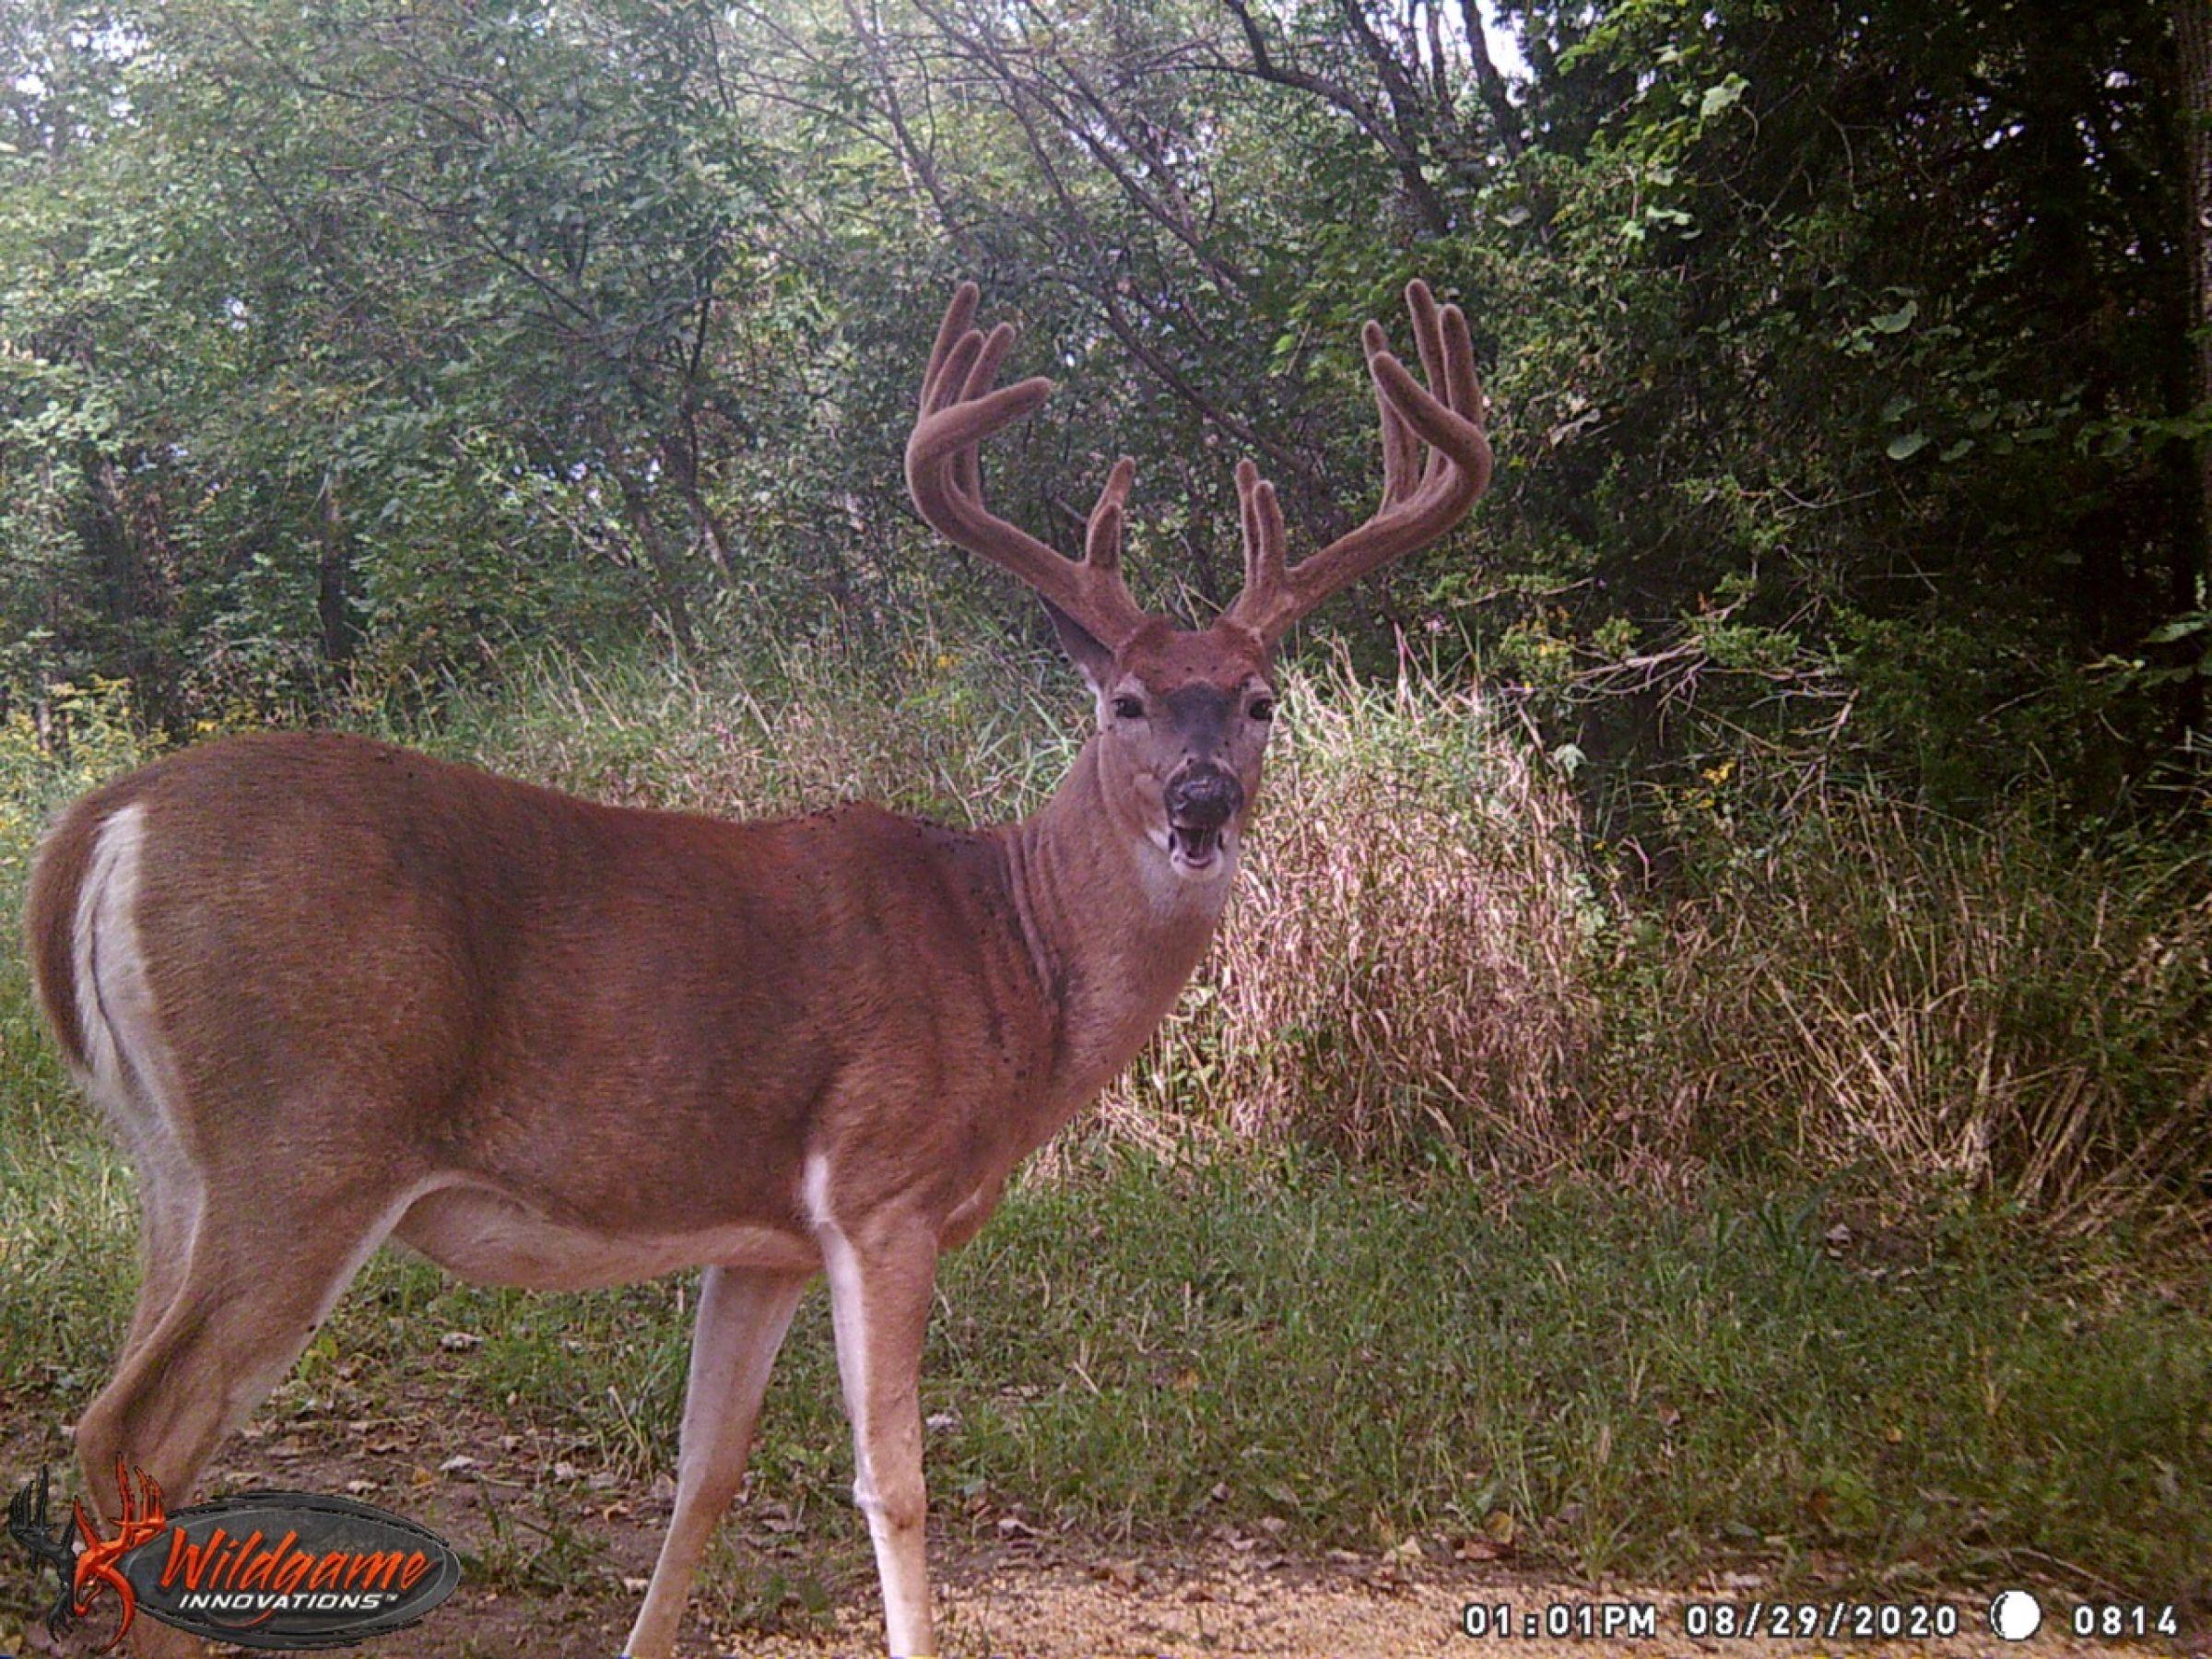 land-clarke-county-iowa-325-acres-listing-number-15416-1-2021-03-17-205902.jpeg